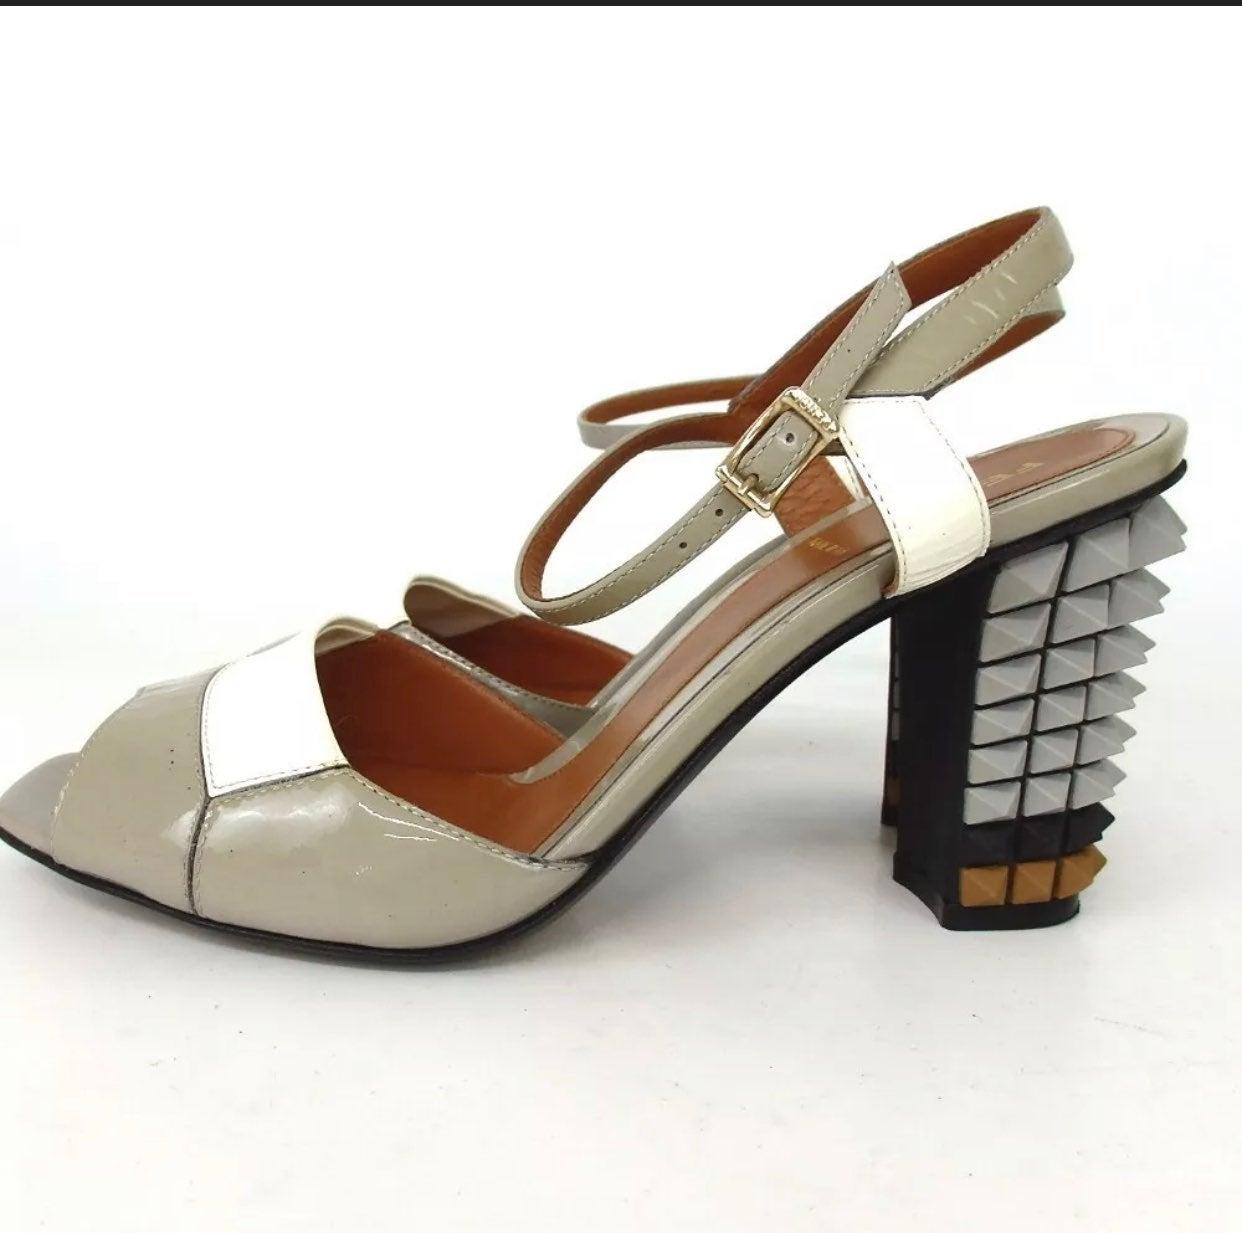 Fendi patent leather sandales